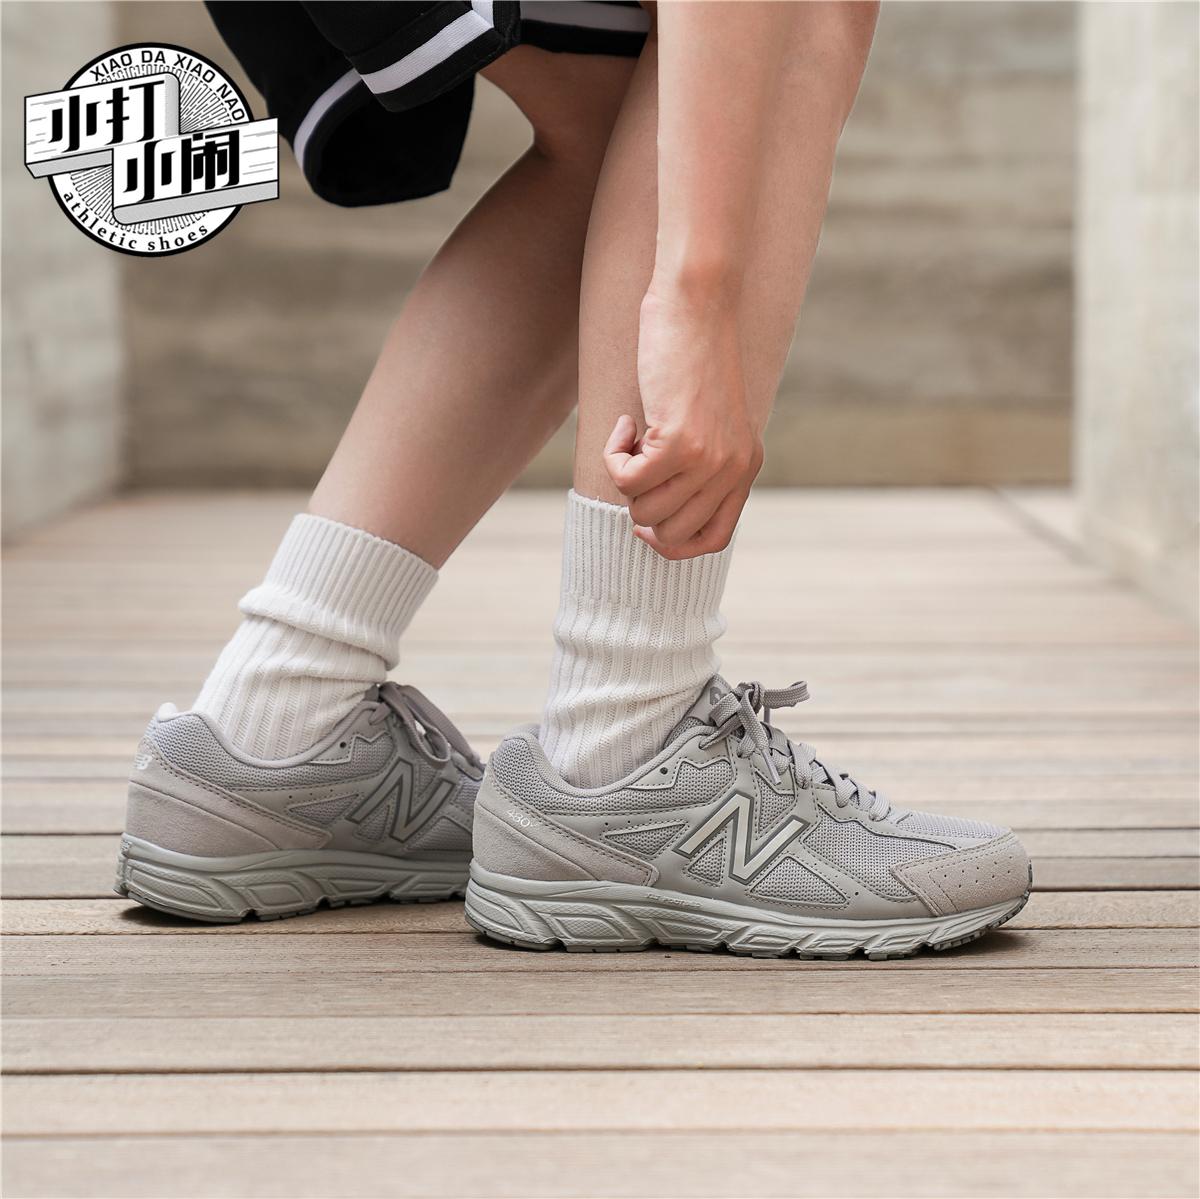 NEW BALANCE/NB 480新款女鞋运动休闲鞋老爹鞋 W480SS5/ST5/SK5